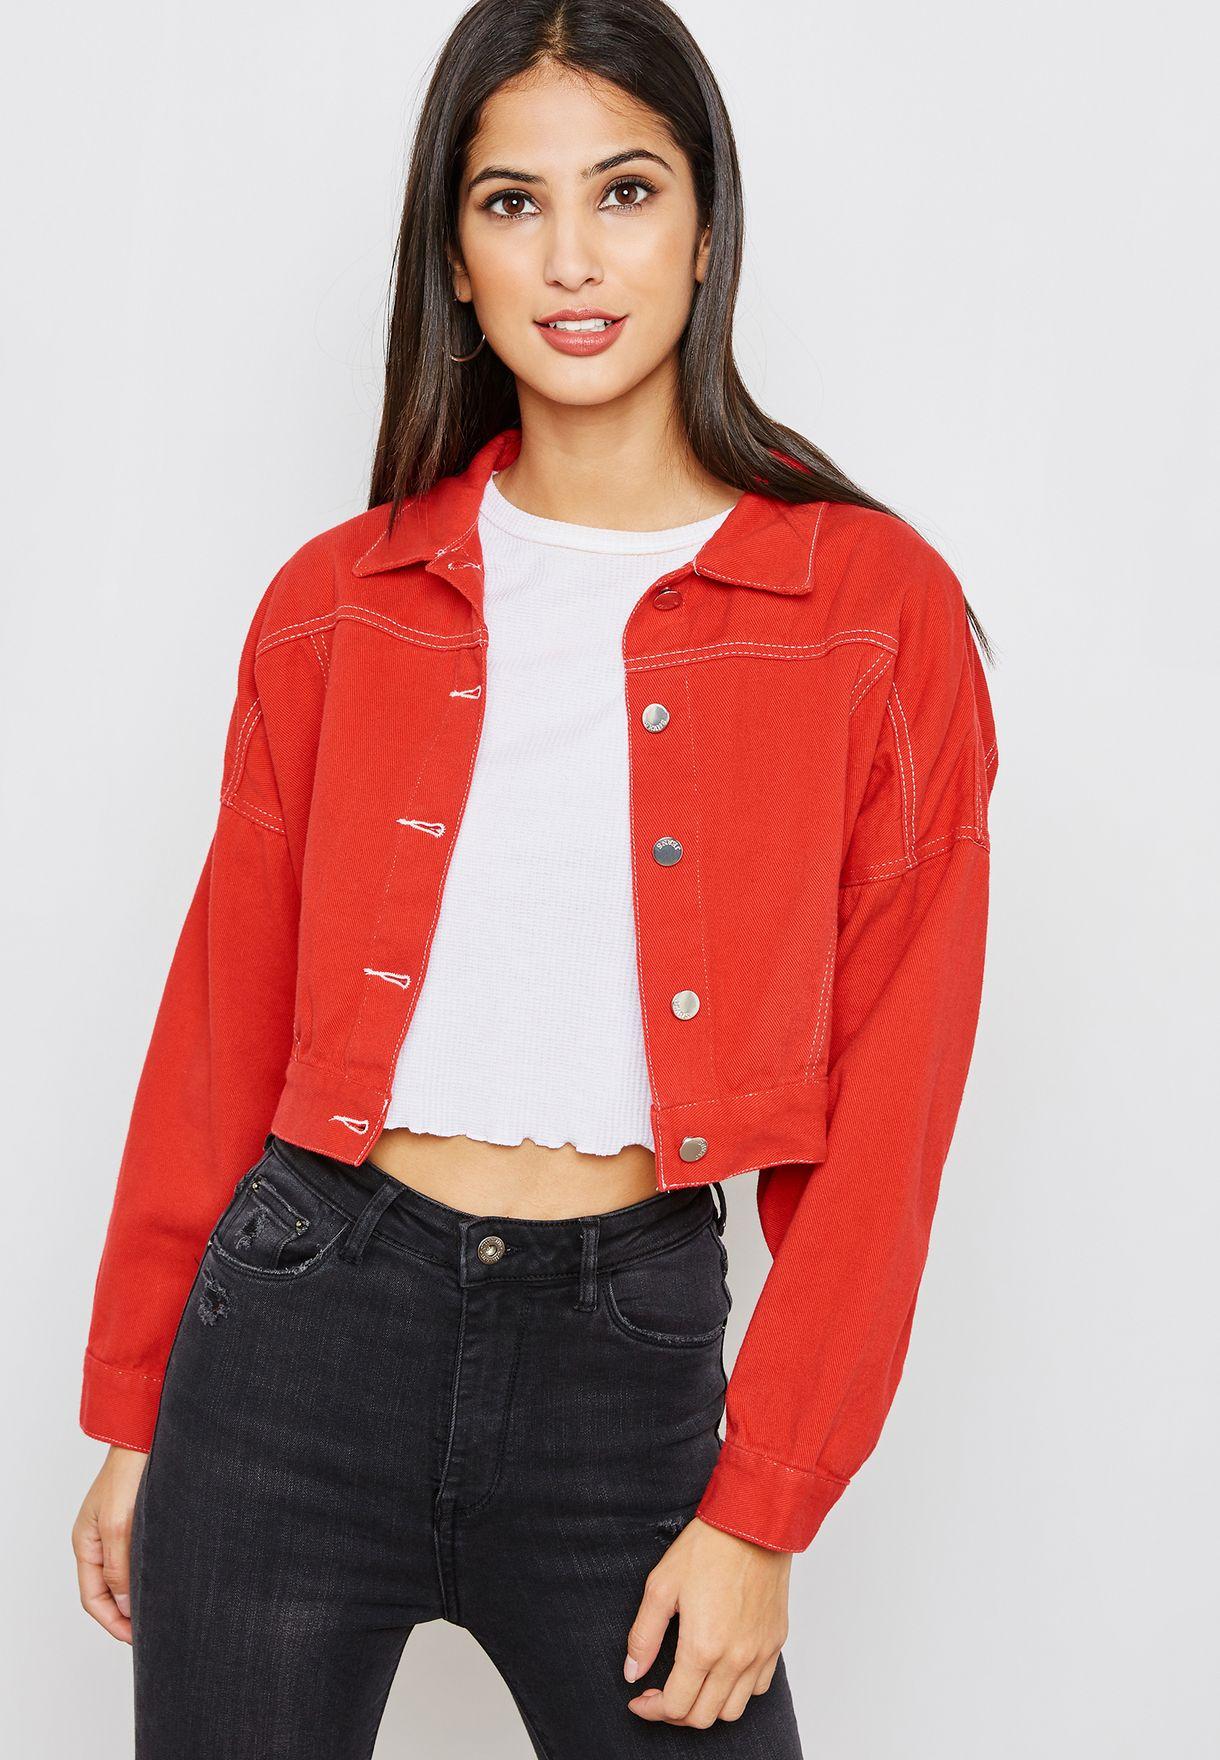 Shop Ginger Red Denim Jacket 8362 For Women In Kuwait Gi121at51pky